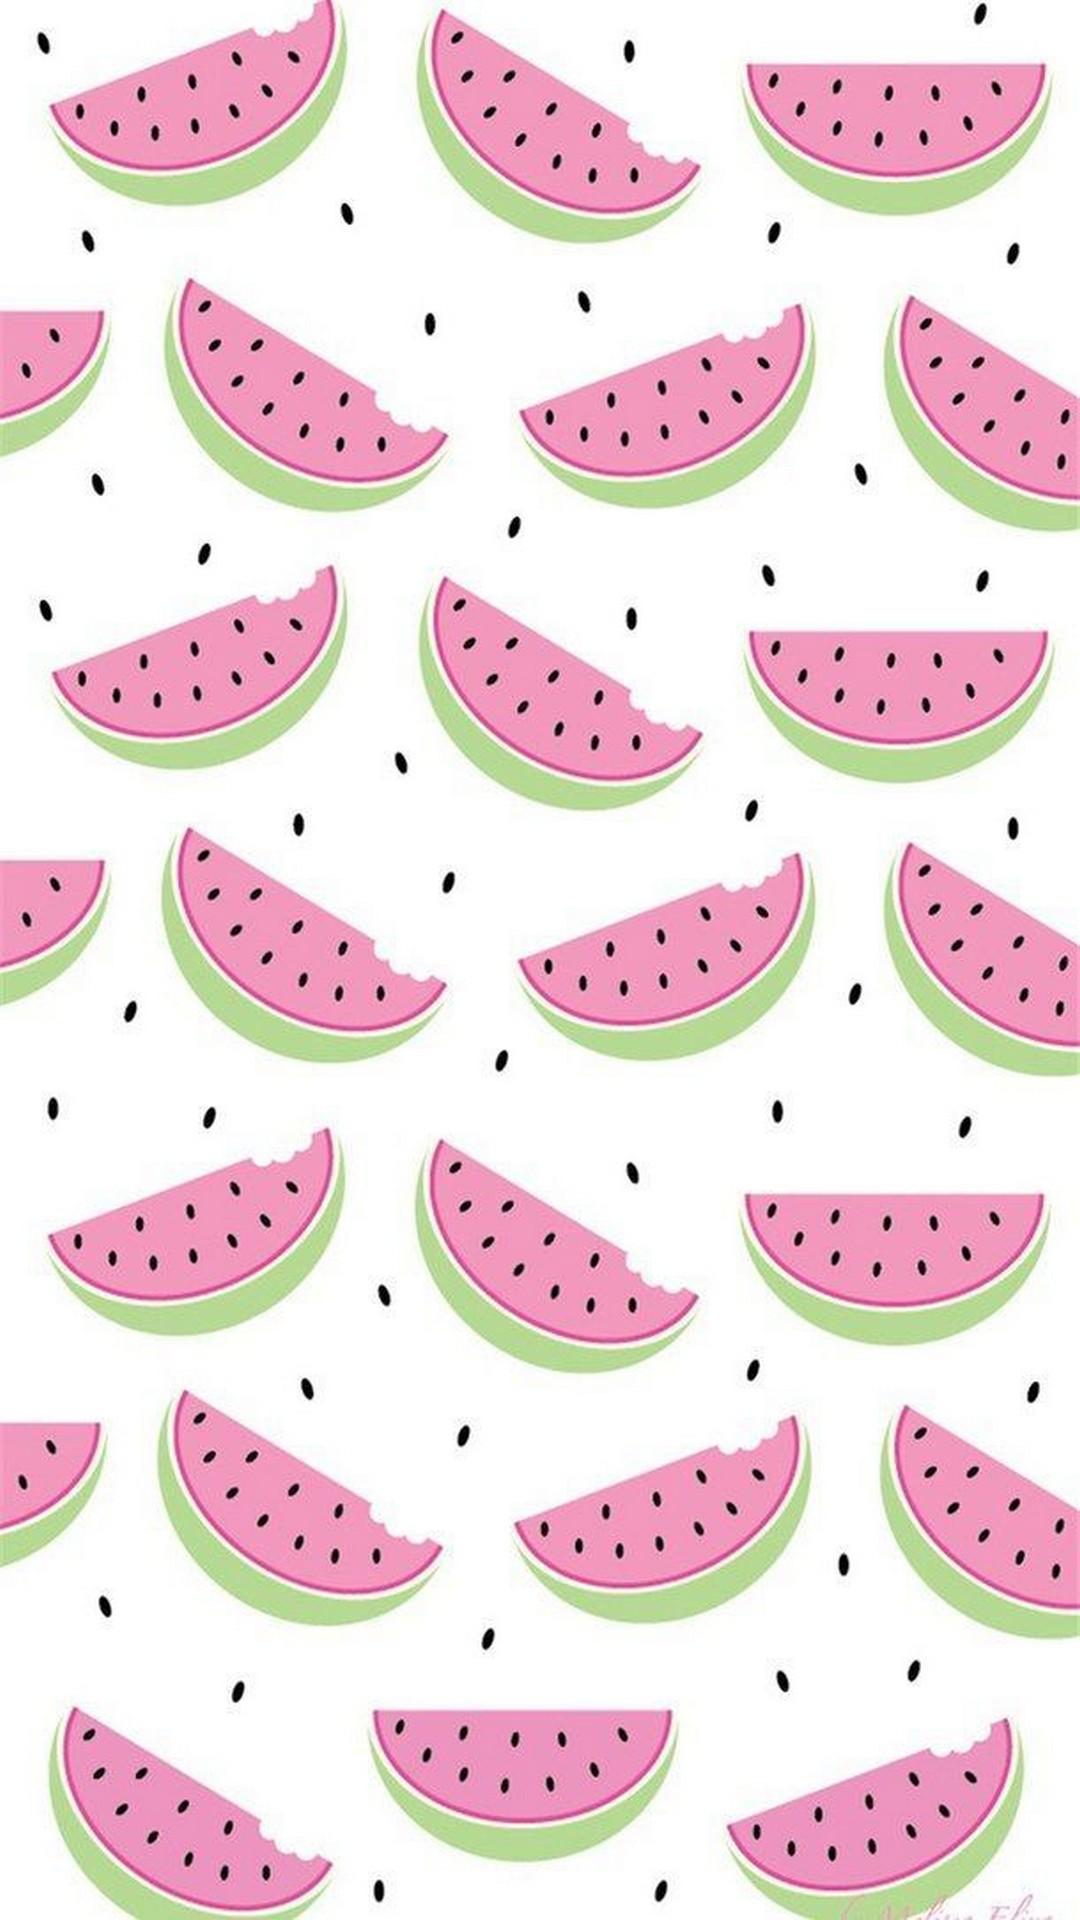 Watermelon Cute Girly Wallpaper iPhone   2019 Cute Wallpapers